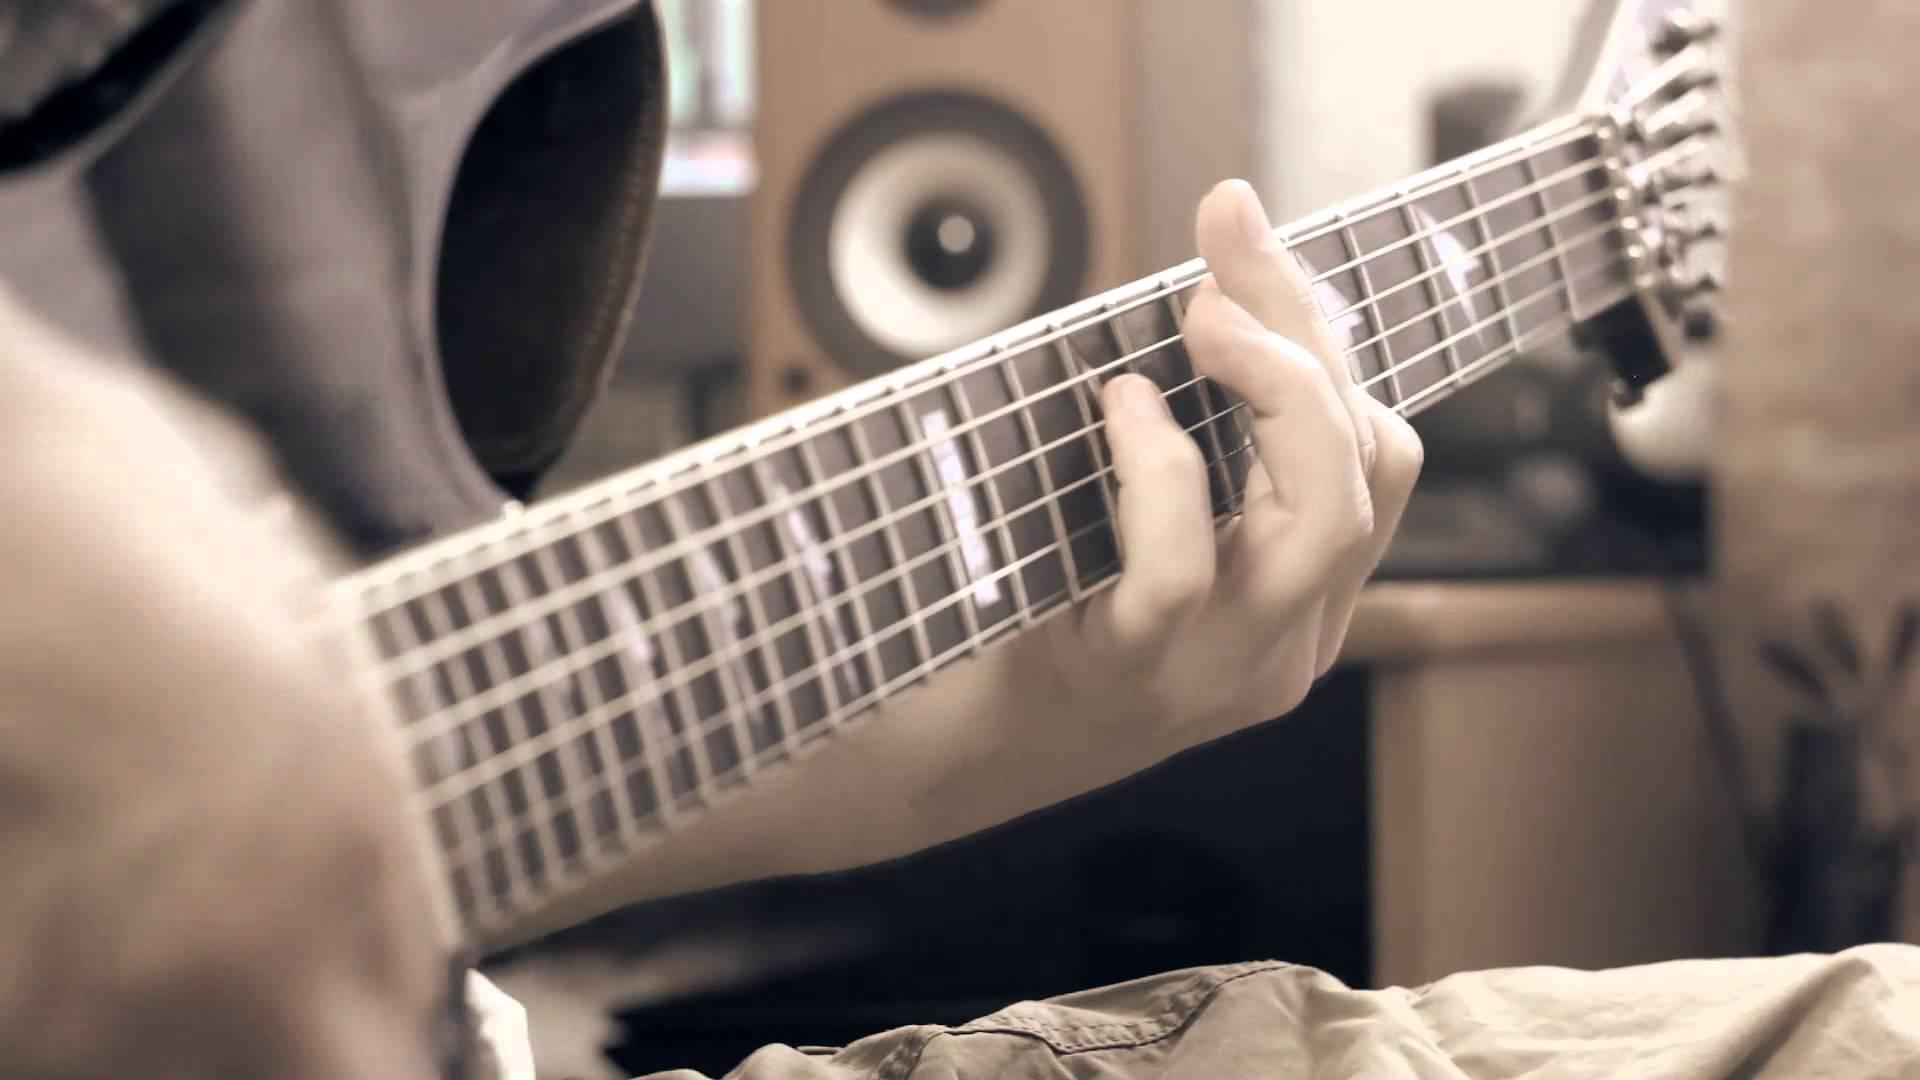 Guitar bohemian rhapsody guitar tabs : Bohemian Rhapsody full tab (Dr. Viossy) | Music | Instrumental